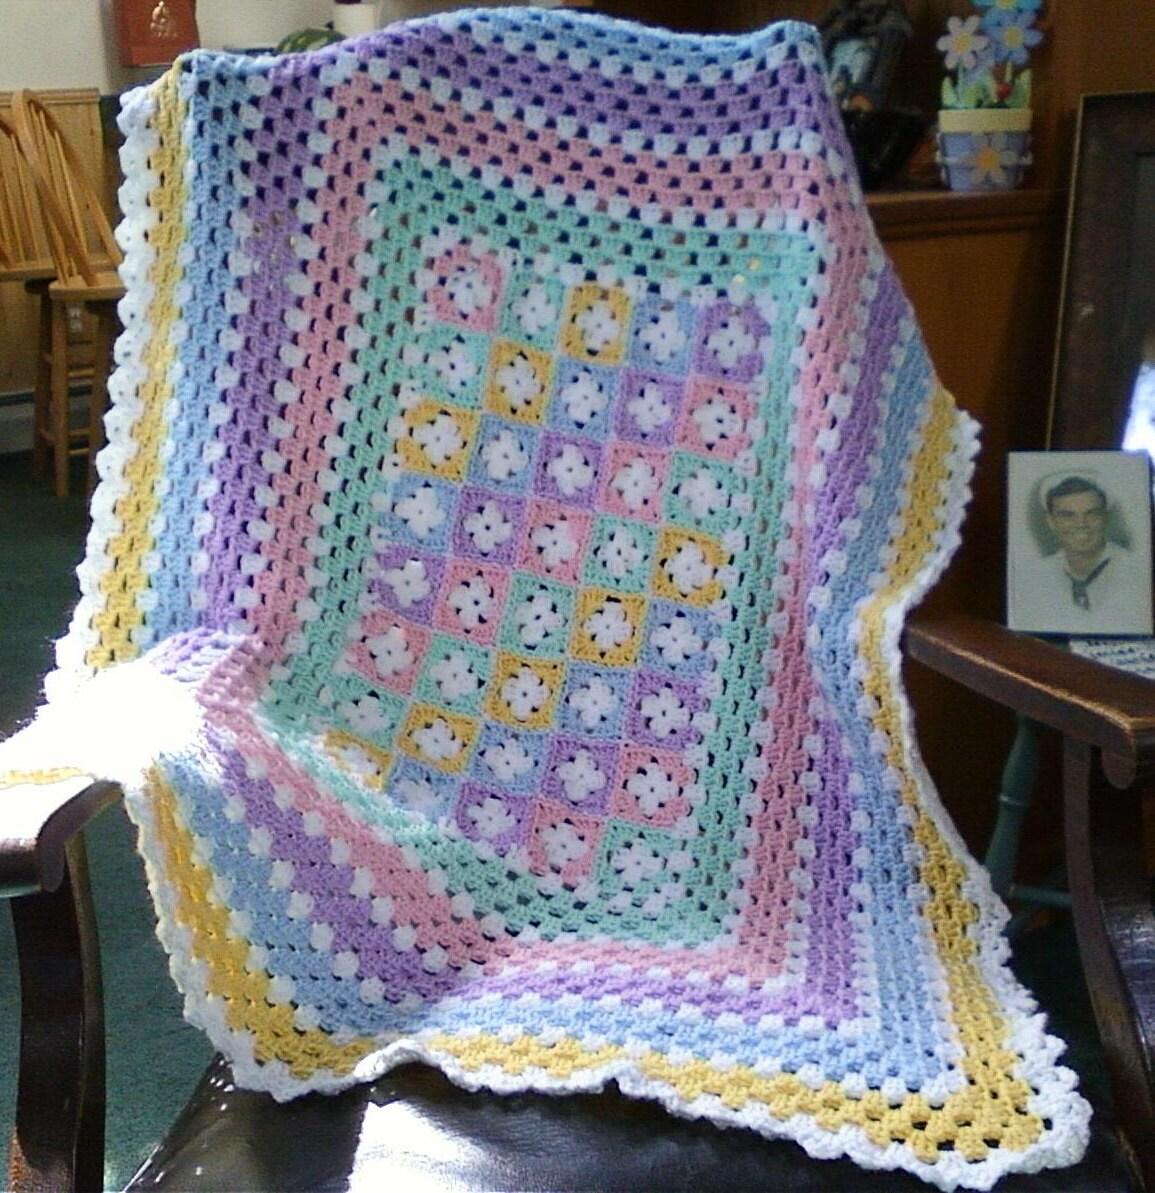 Baby Crochet Patterns Etsy : Pastel Crochet Baby Afghan by SleepyHollowCrochet on Etsy